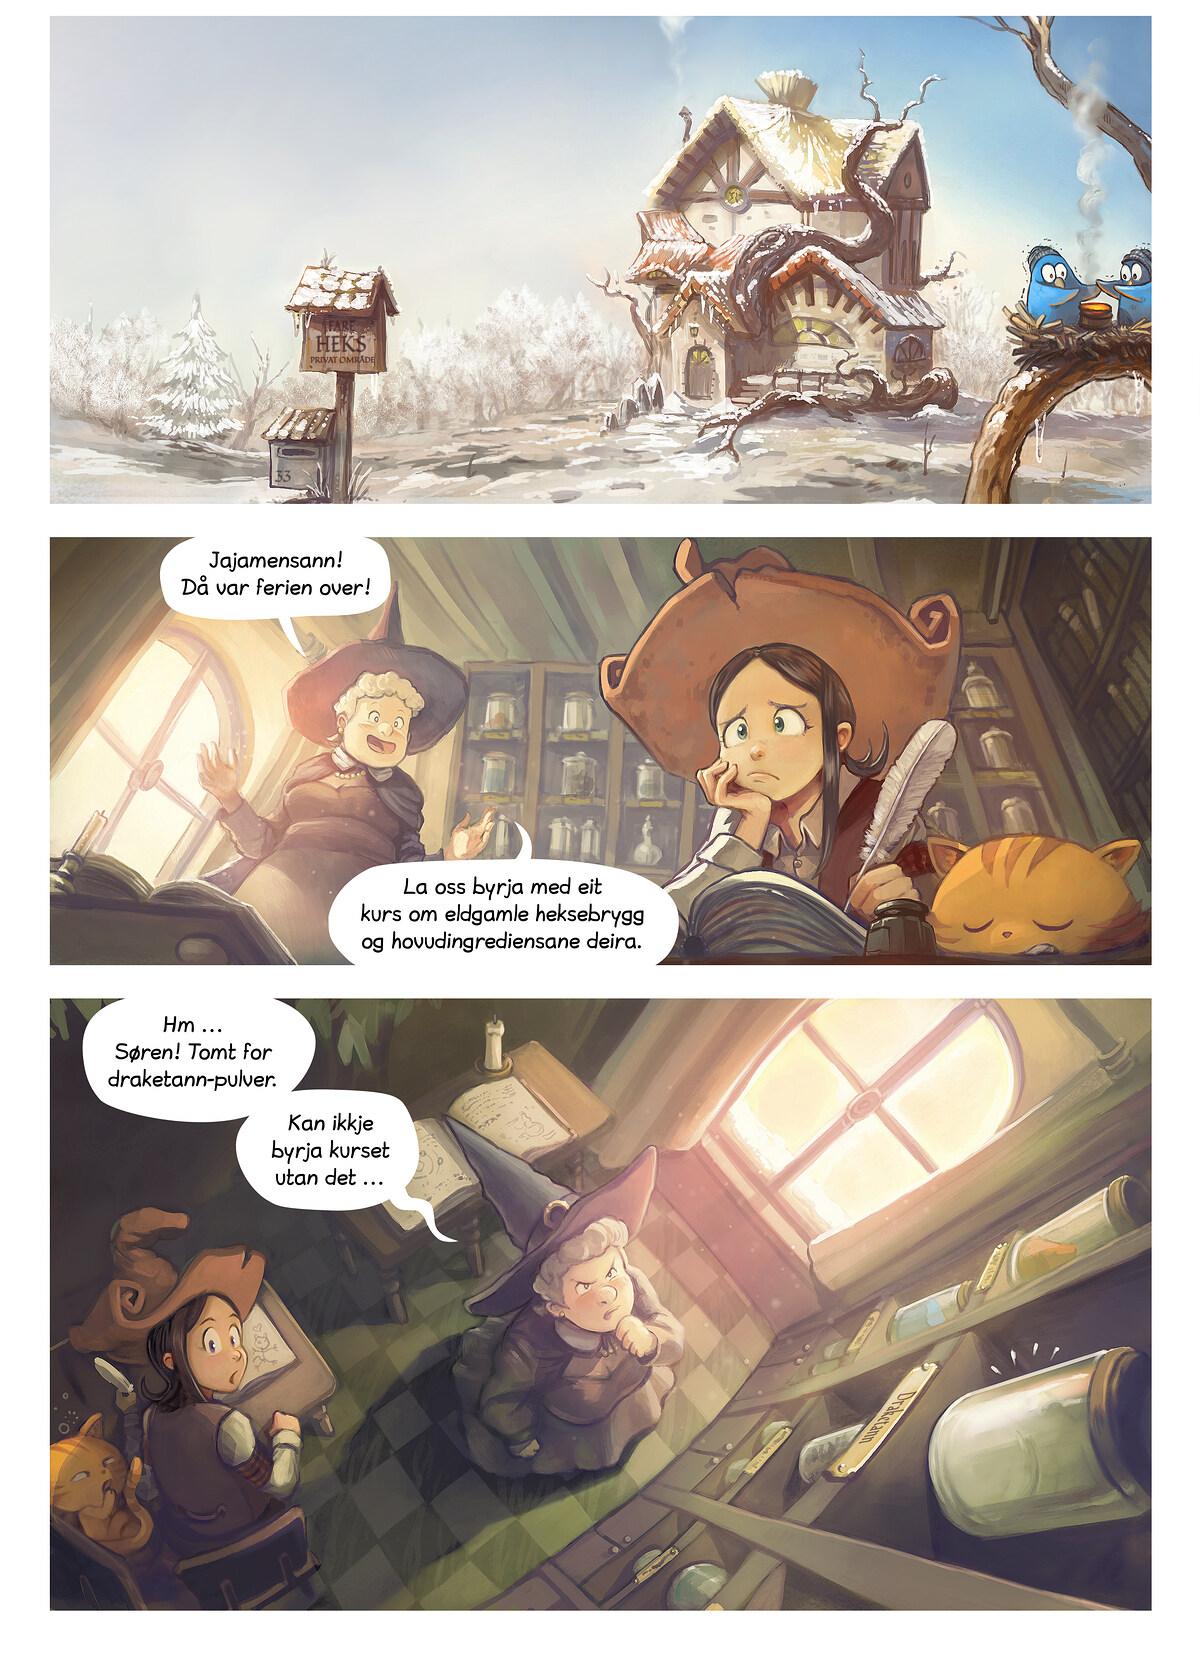 Episode 14: Draketanna, Side 1